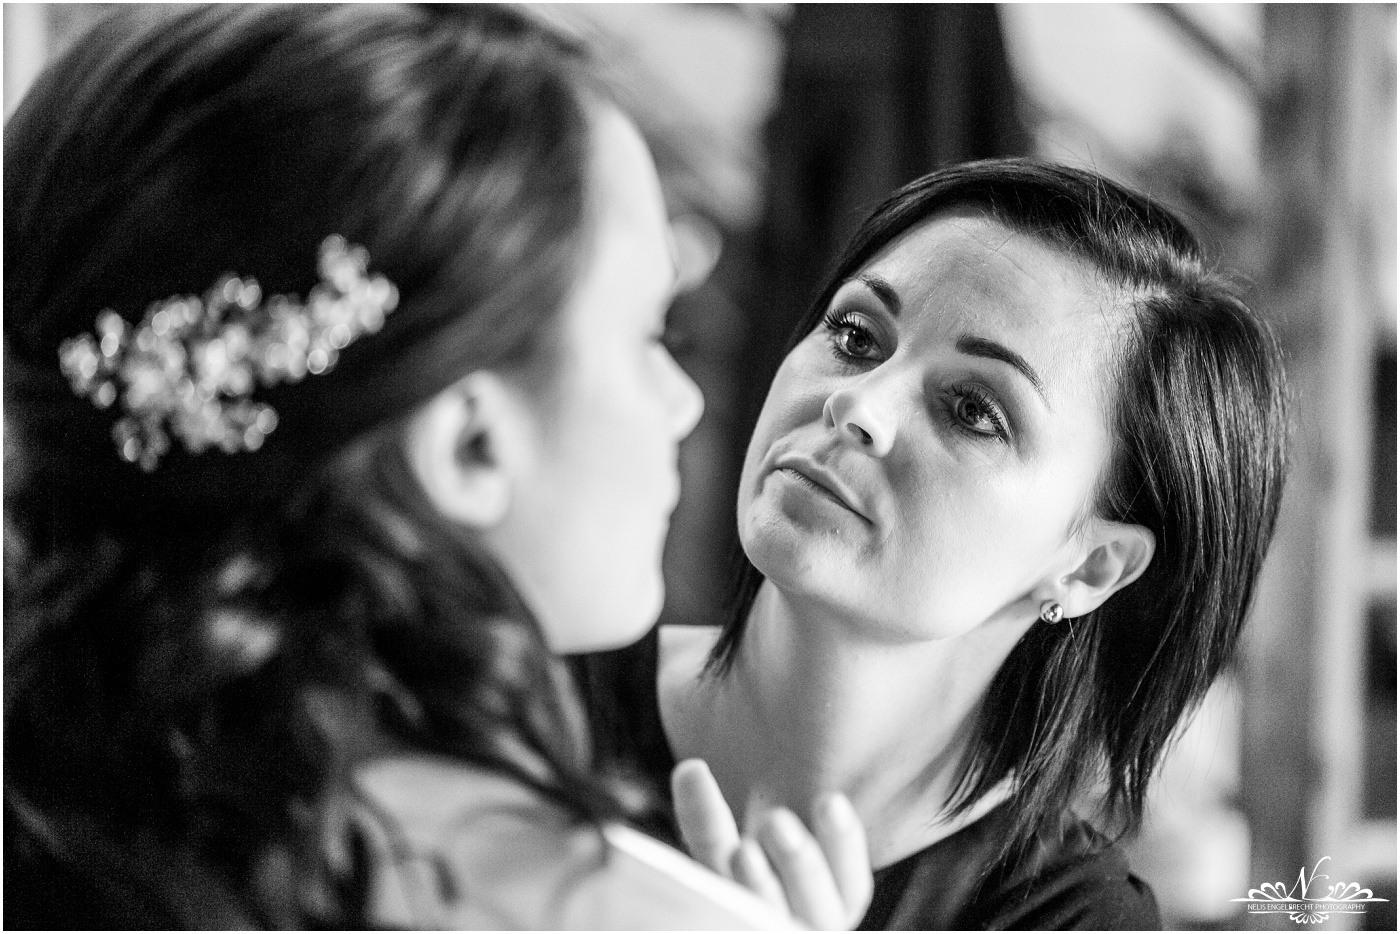 Eensgezind-Wedding-Photos-Nelis-Engelbrecht-Photography-025